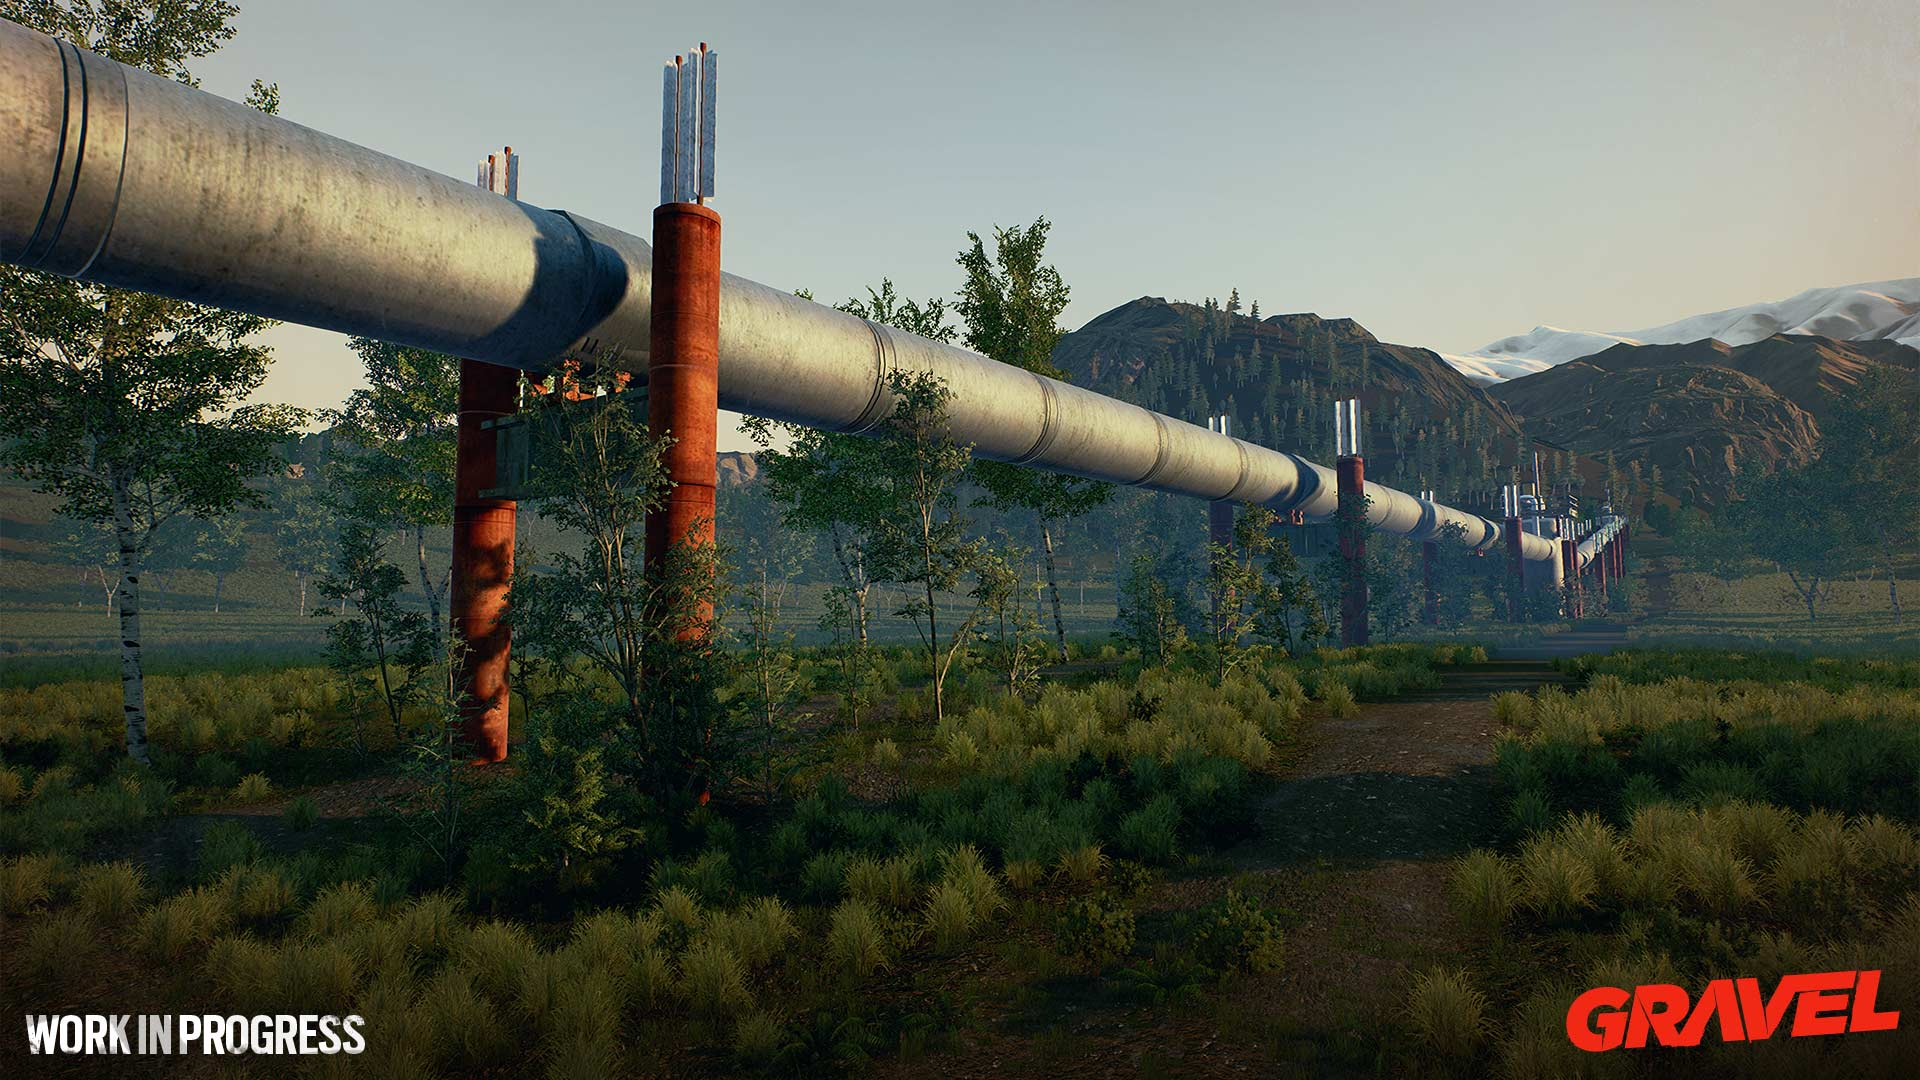 Gravel wip pipeline